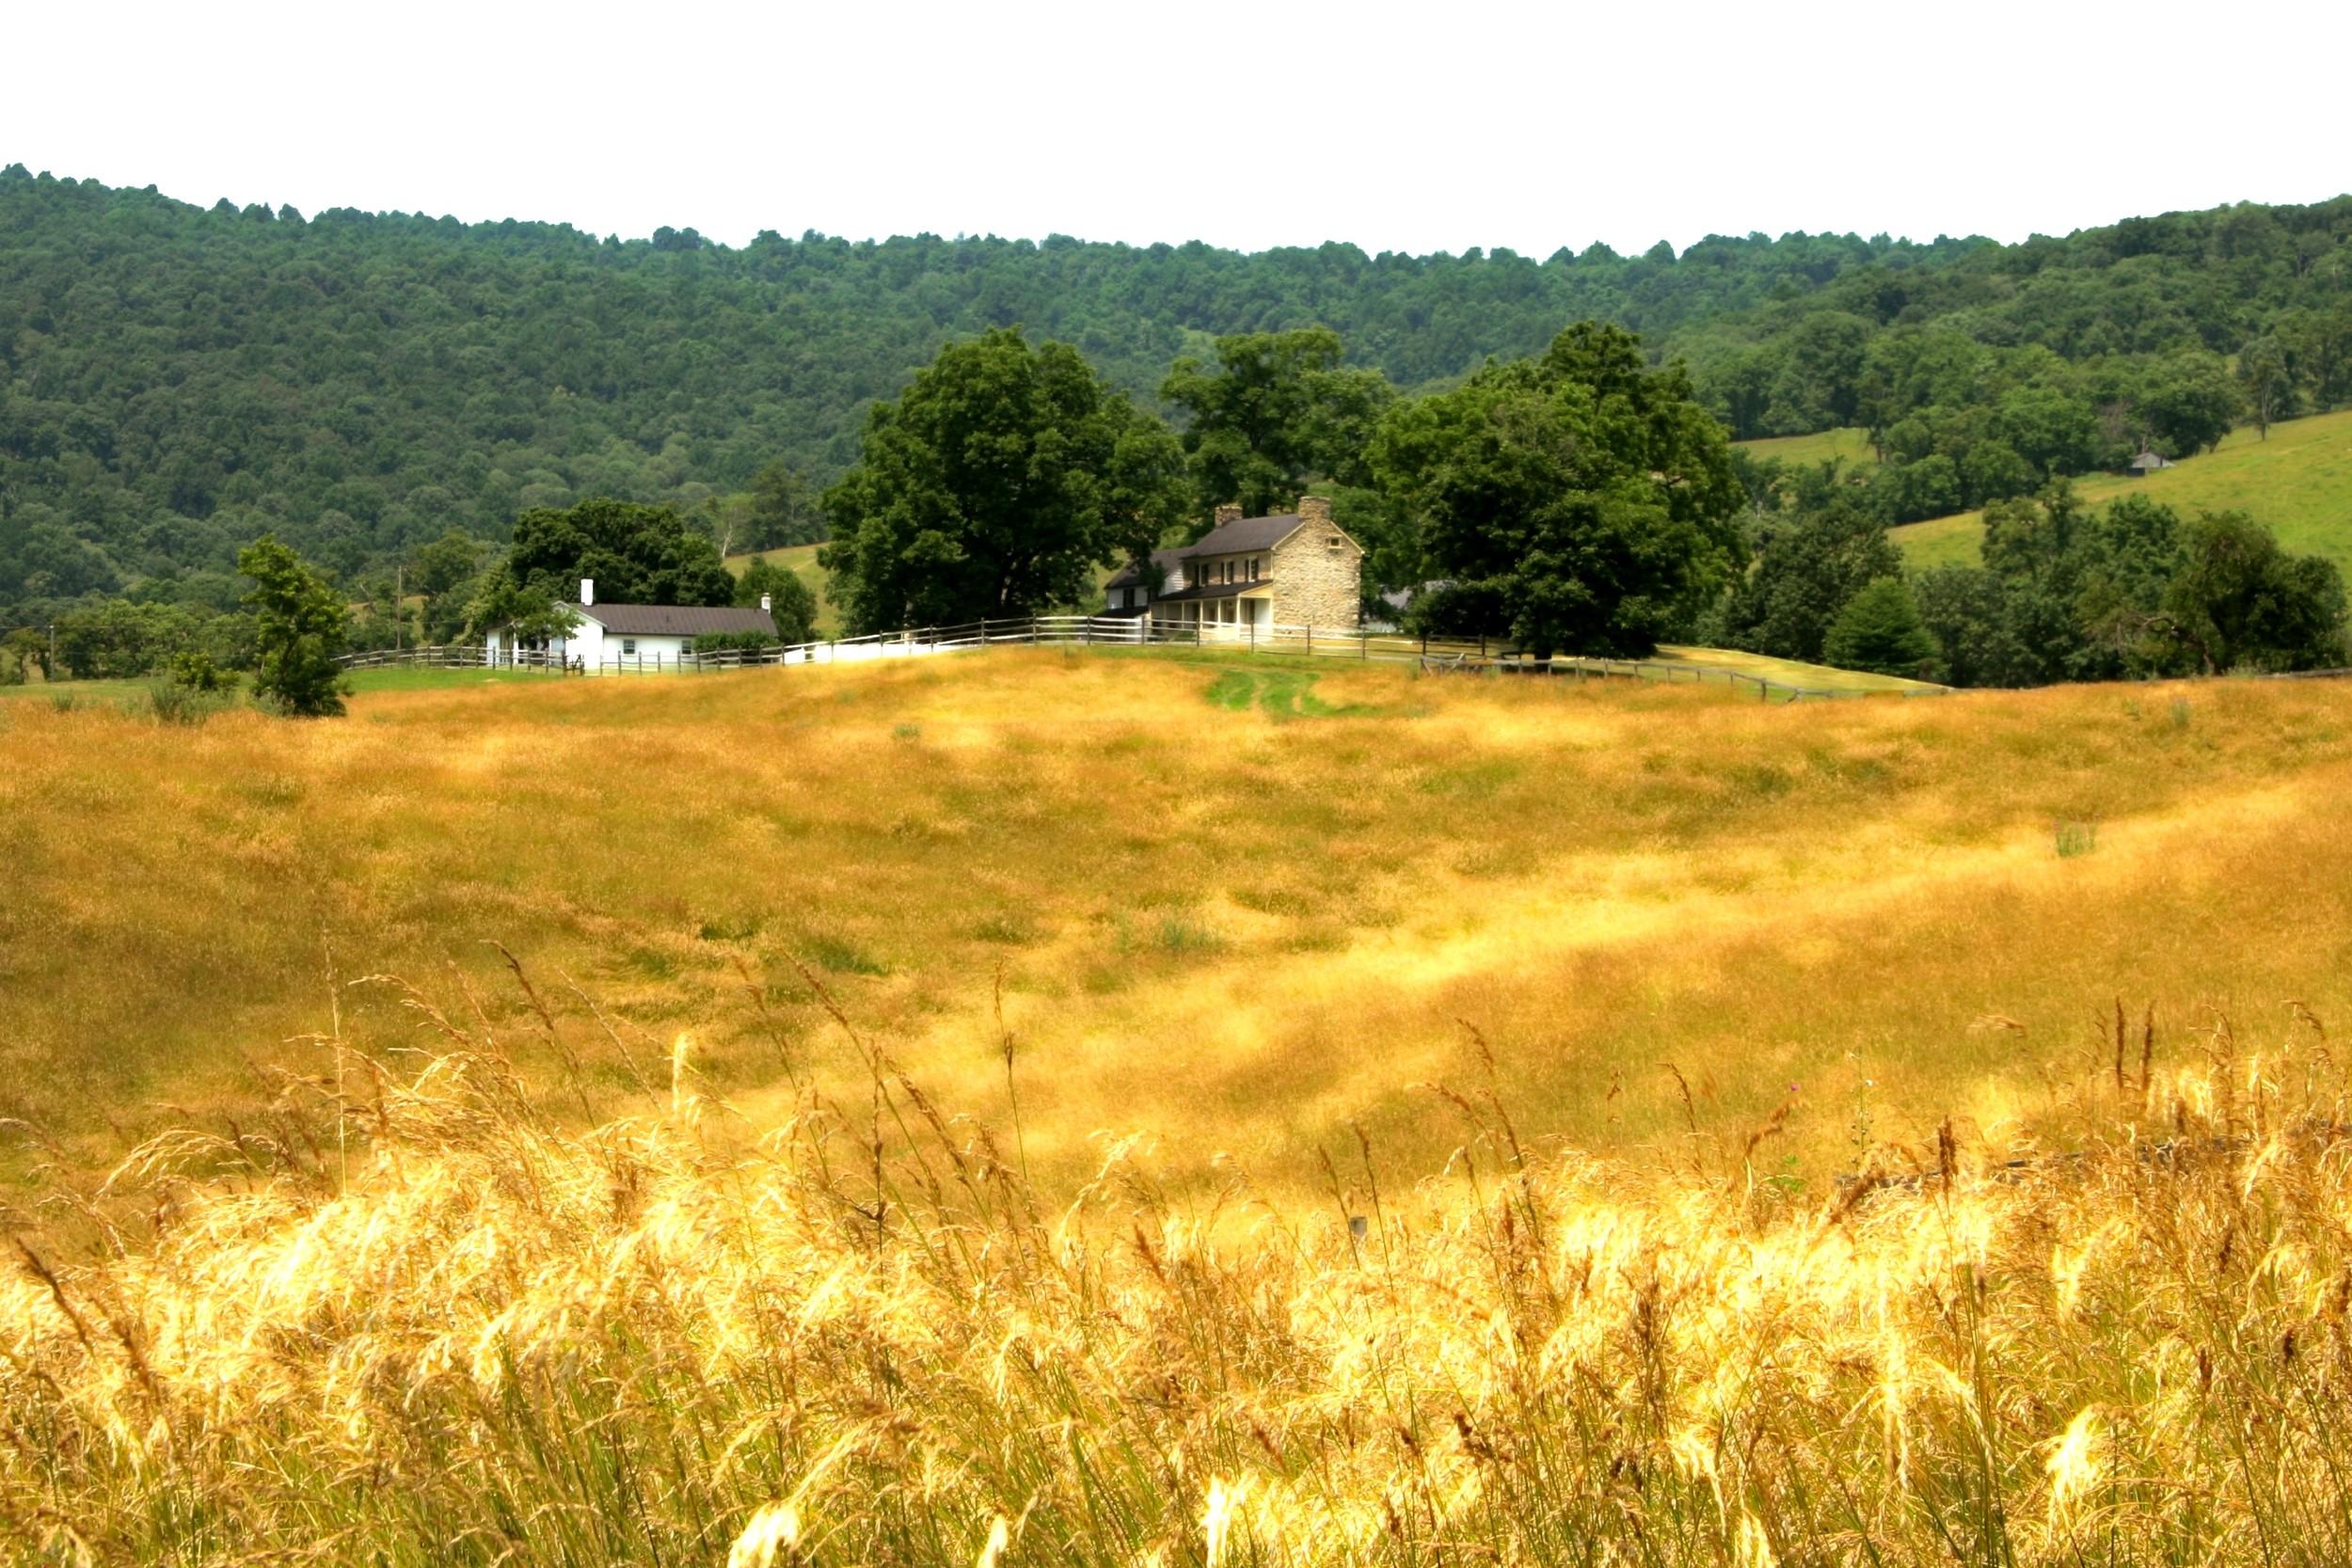 A windy summer day looking toward Mount Bleak, Fauquier County.